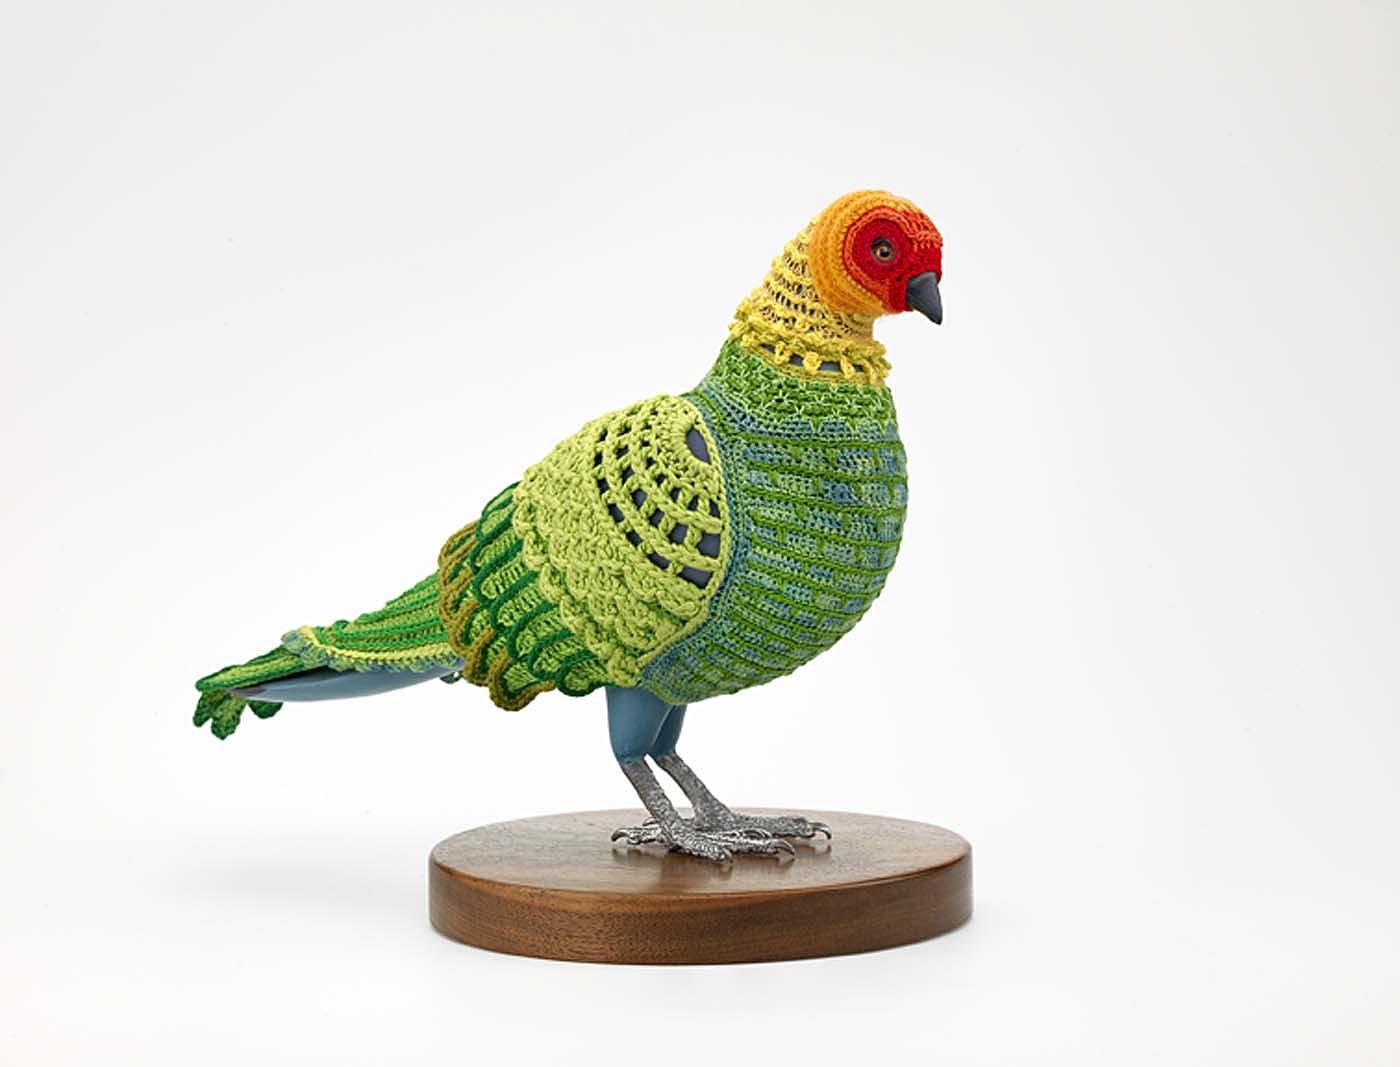 images for Biodiversity Reclamation Suit: Carolina Parakeet